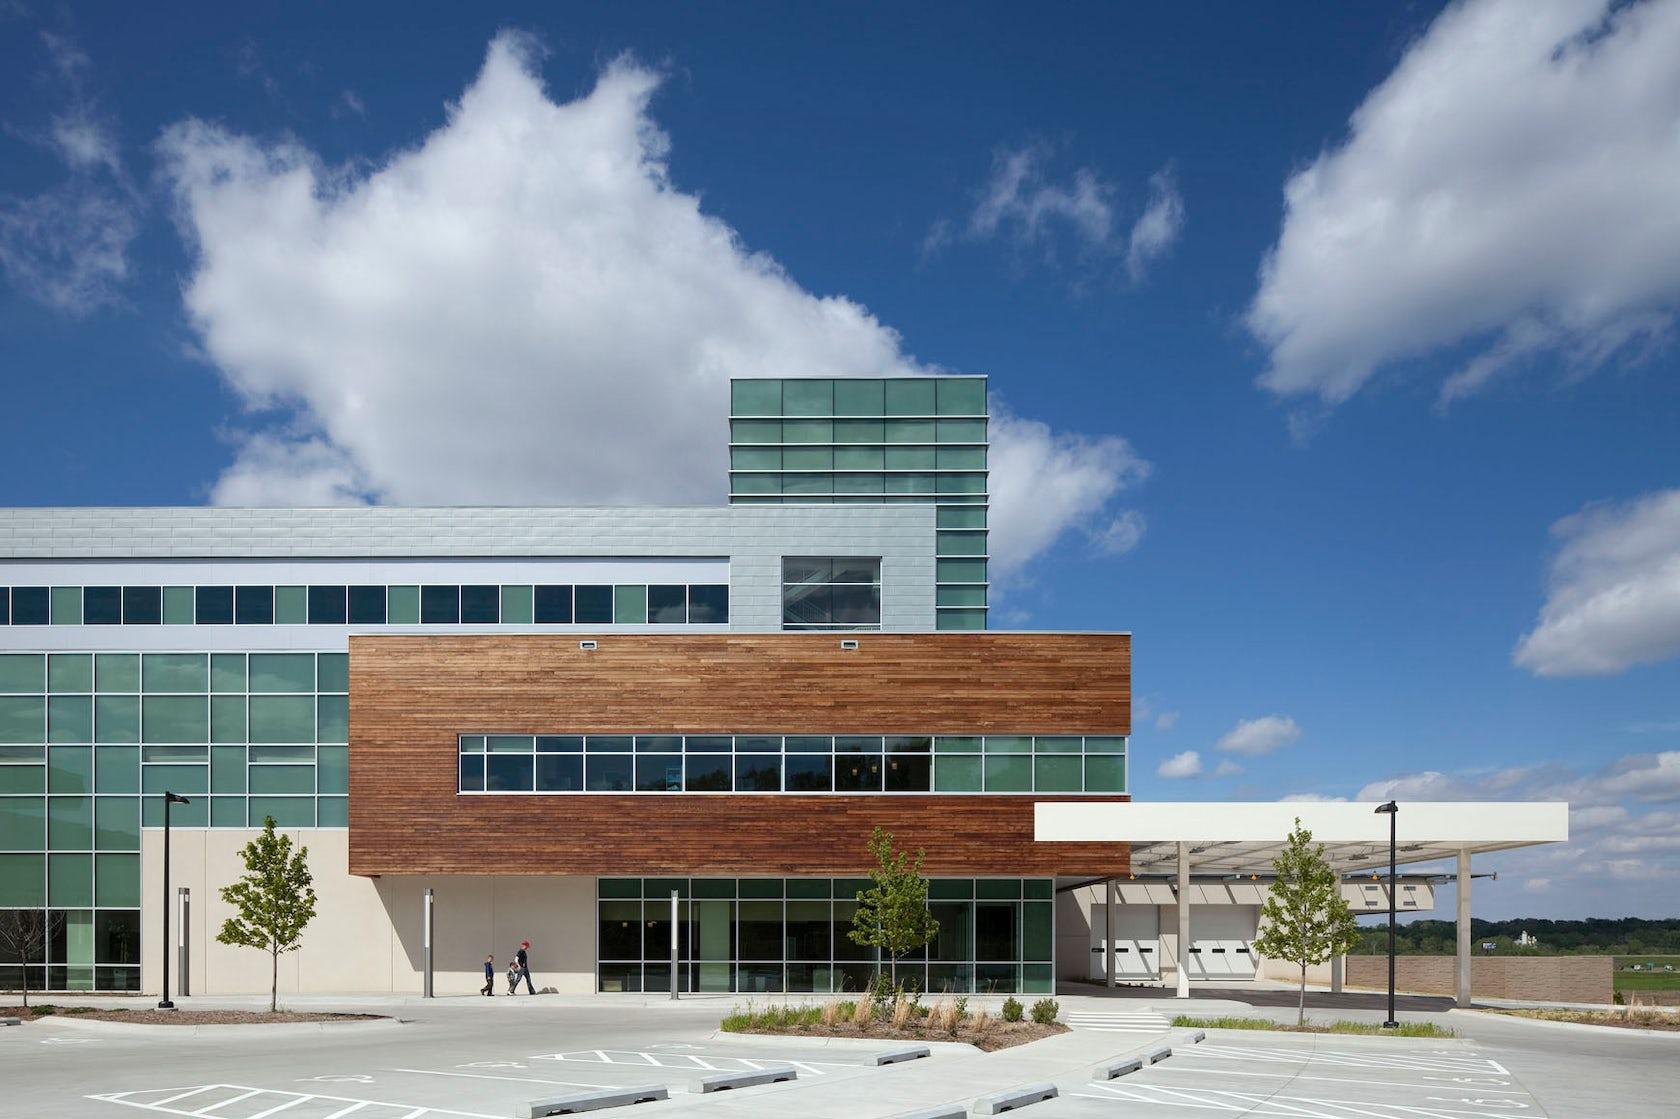 Bellevue Medical Center Architizer